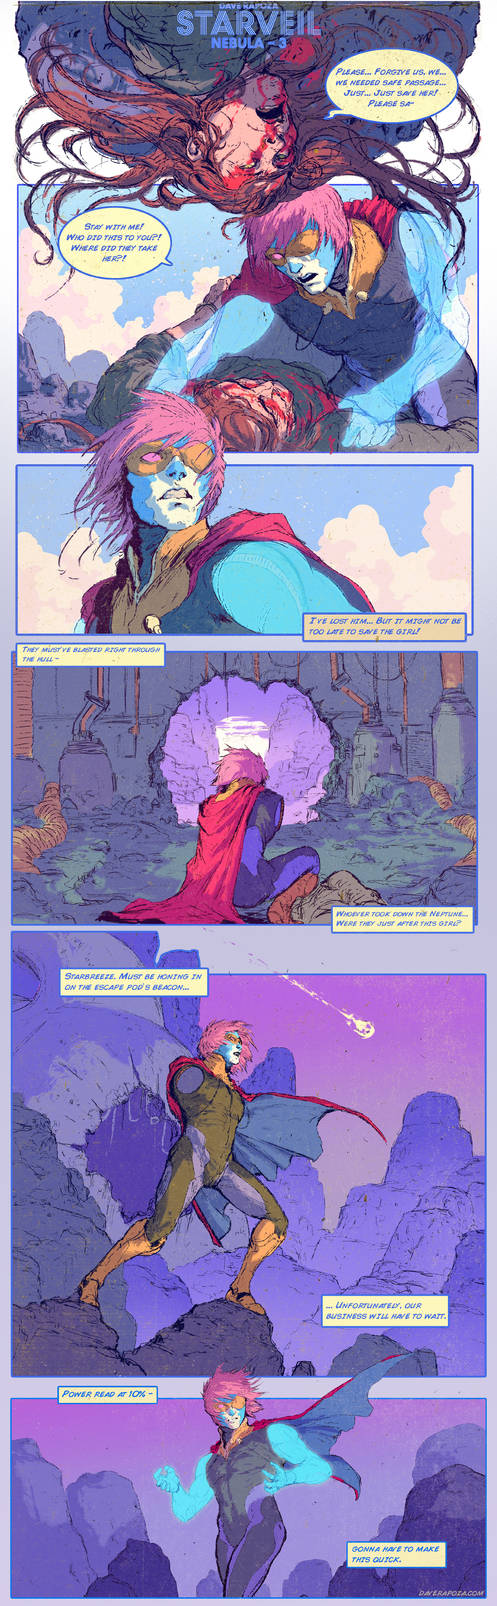 StarVeil - Nebula #3 by DaveRapoza